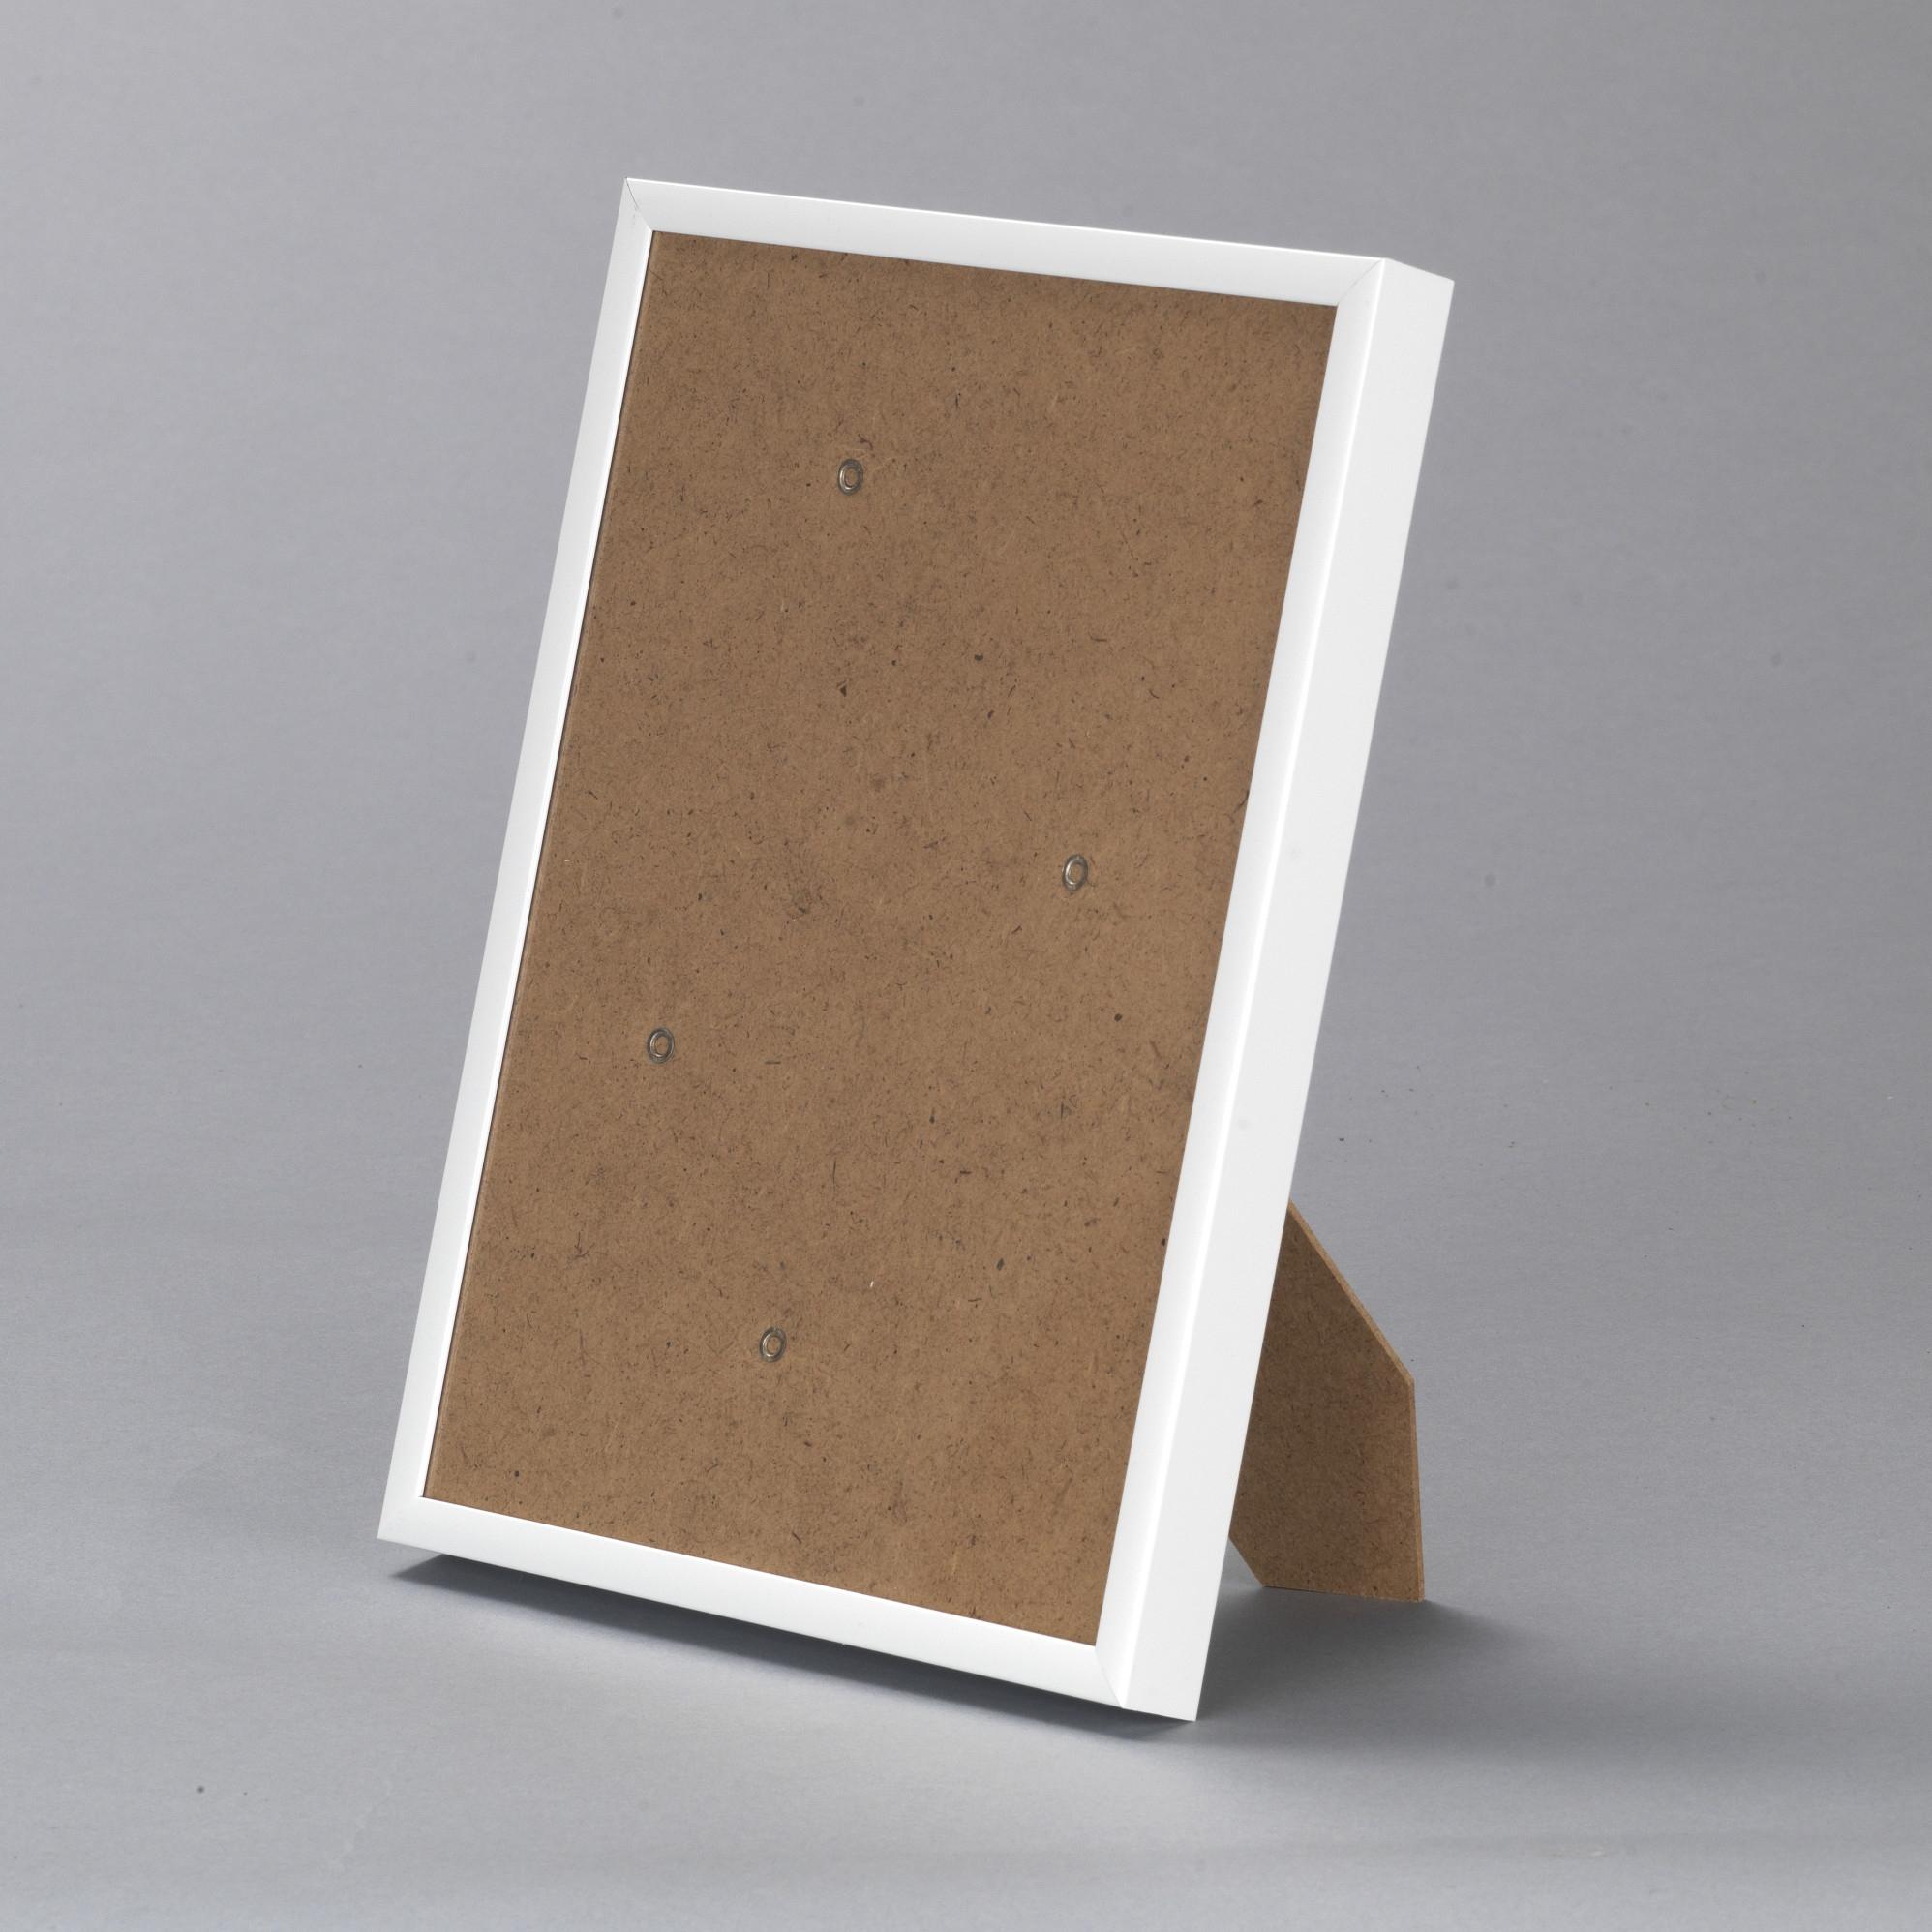 cadre aluminium blanc 40x60 pas cher cadre photo aluminium blanc 40x60 destock cadre. Black Bedroom Furniture Sets. Home Design Ideas